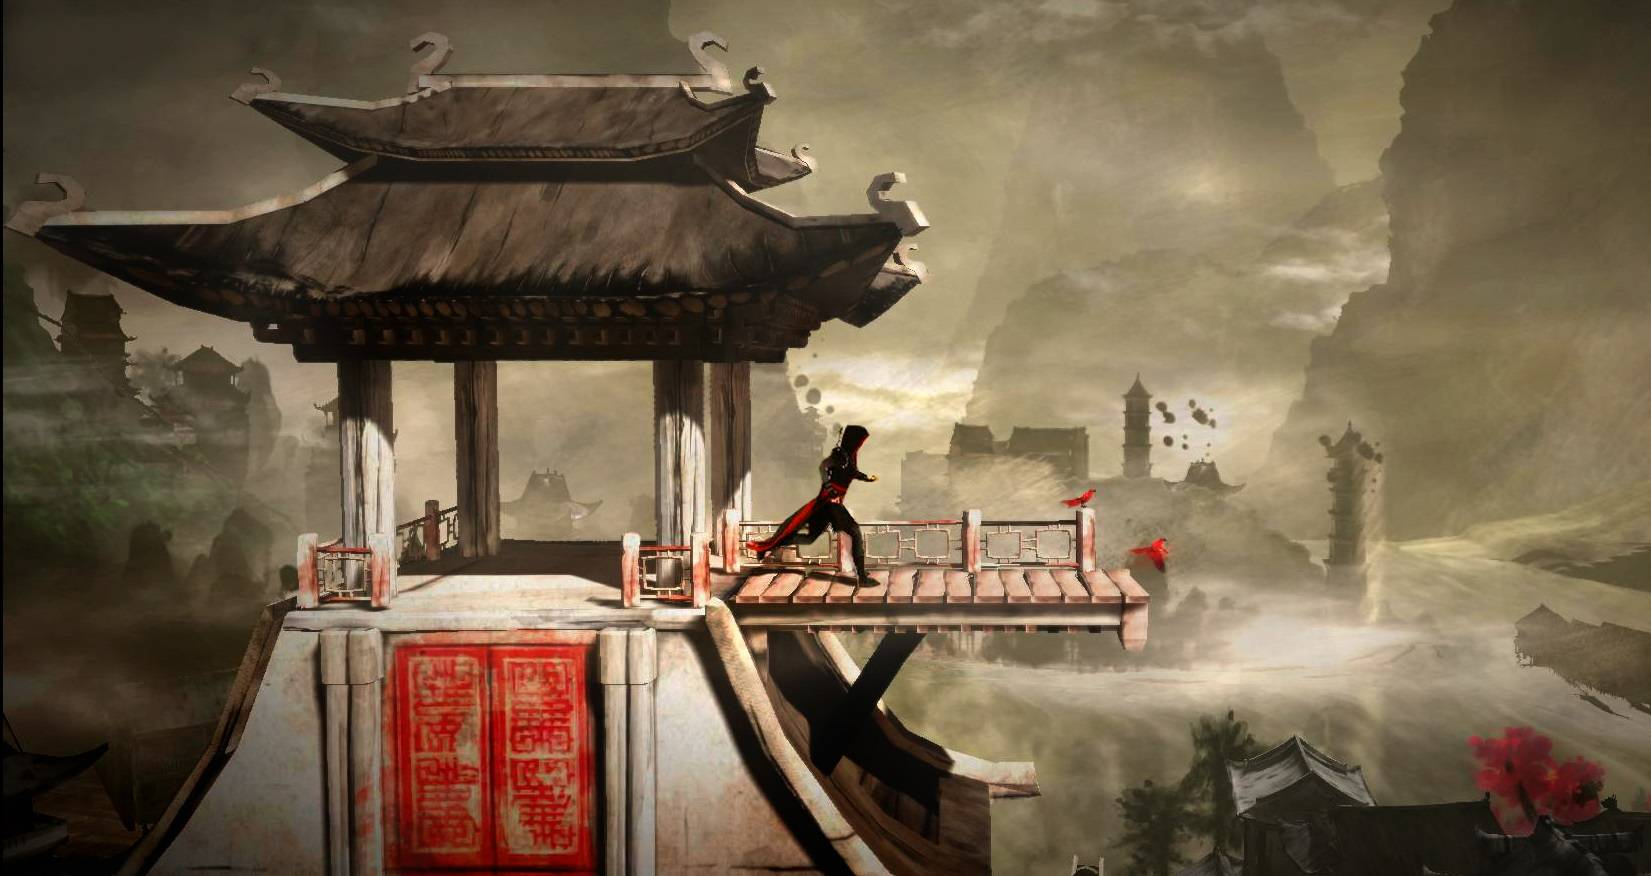 Раздача: хоррор про перевал Дятлова и Assassin's Creed в Китае